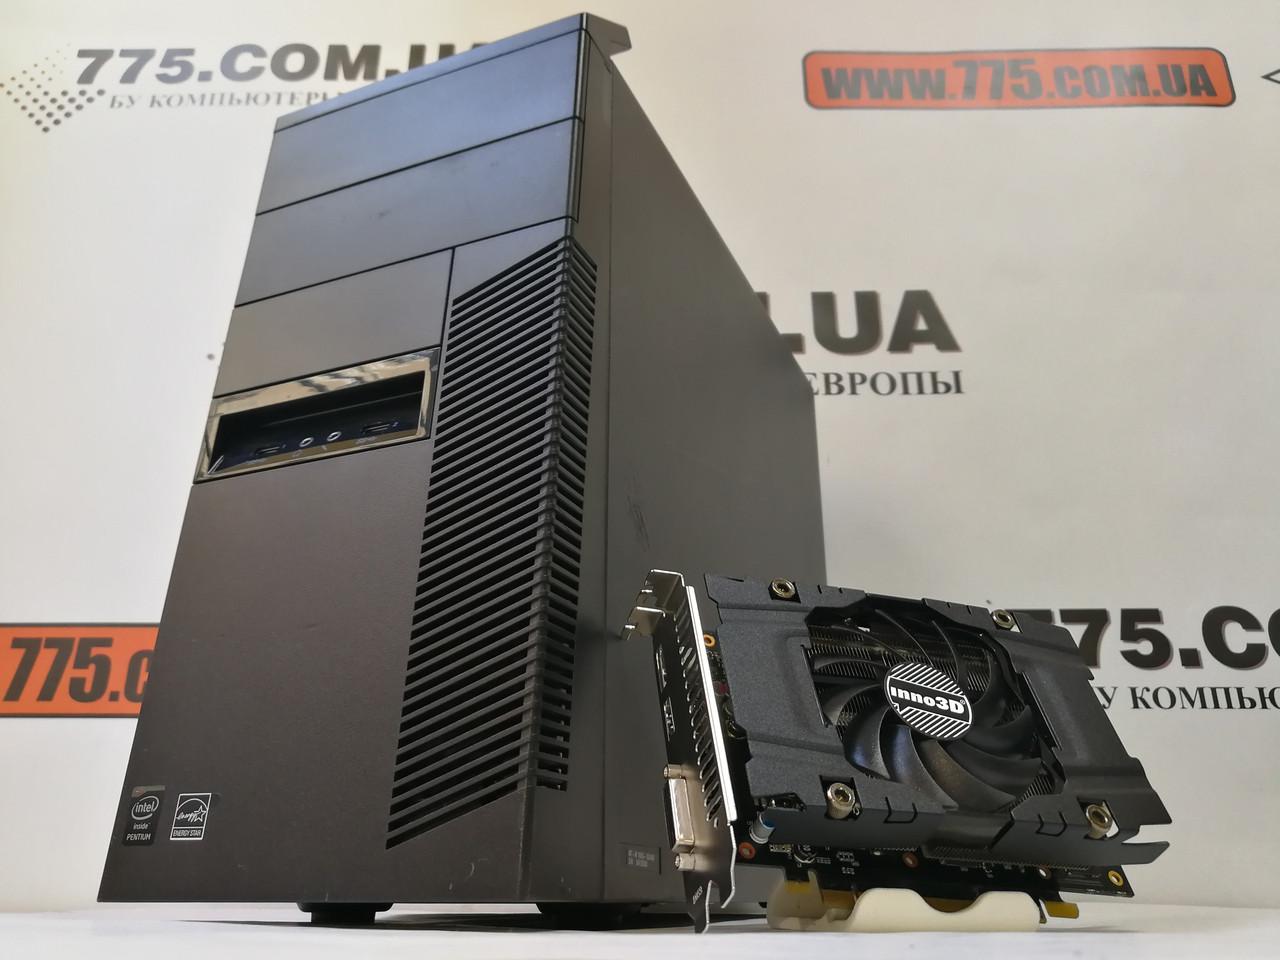 Компьютер Lenovo M83 (Tower), Intel Core i3-4130 3.4GHz, RAM 6ГБ, HDD 250ГБ, GeForce GTX 1060 3ГБ